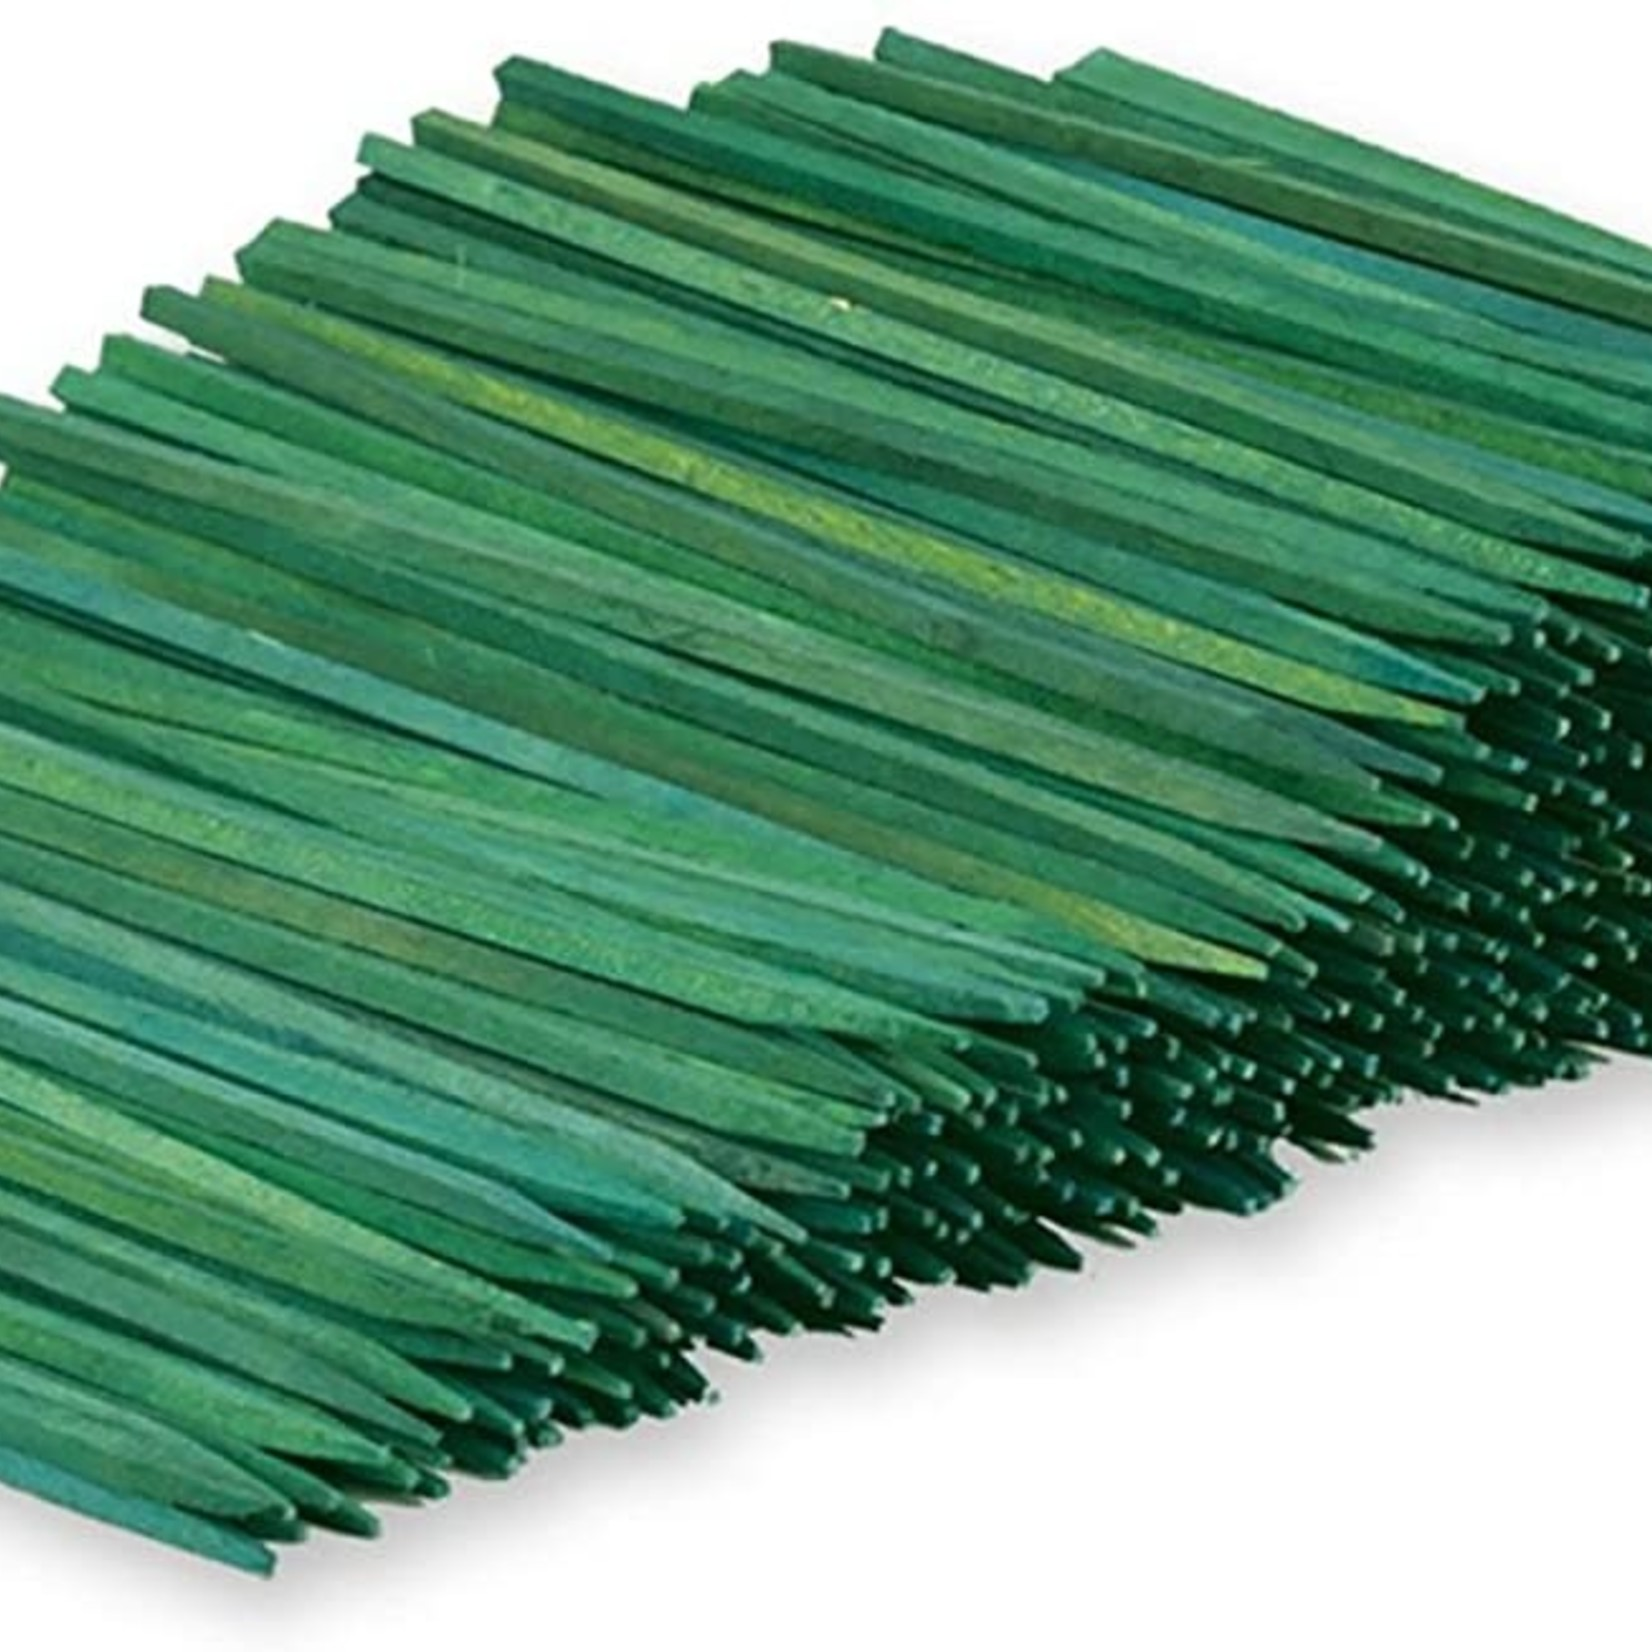 "15"" GREEN PLANT STAKES 6000PCS"